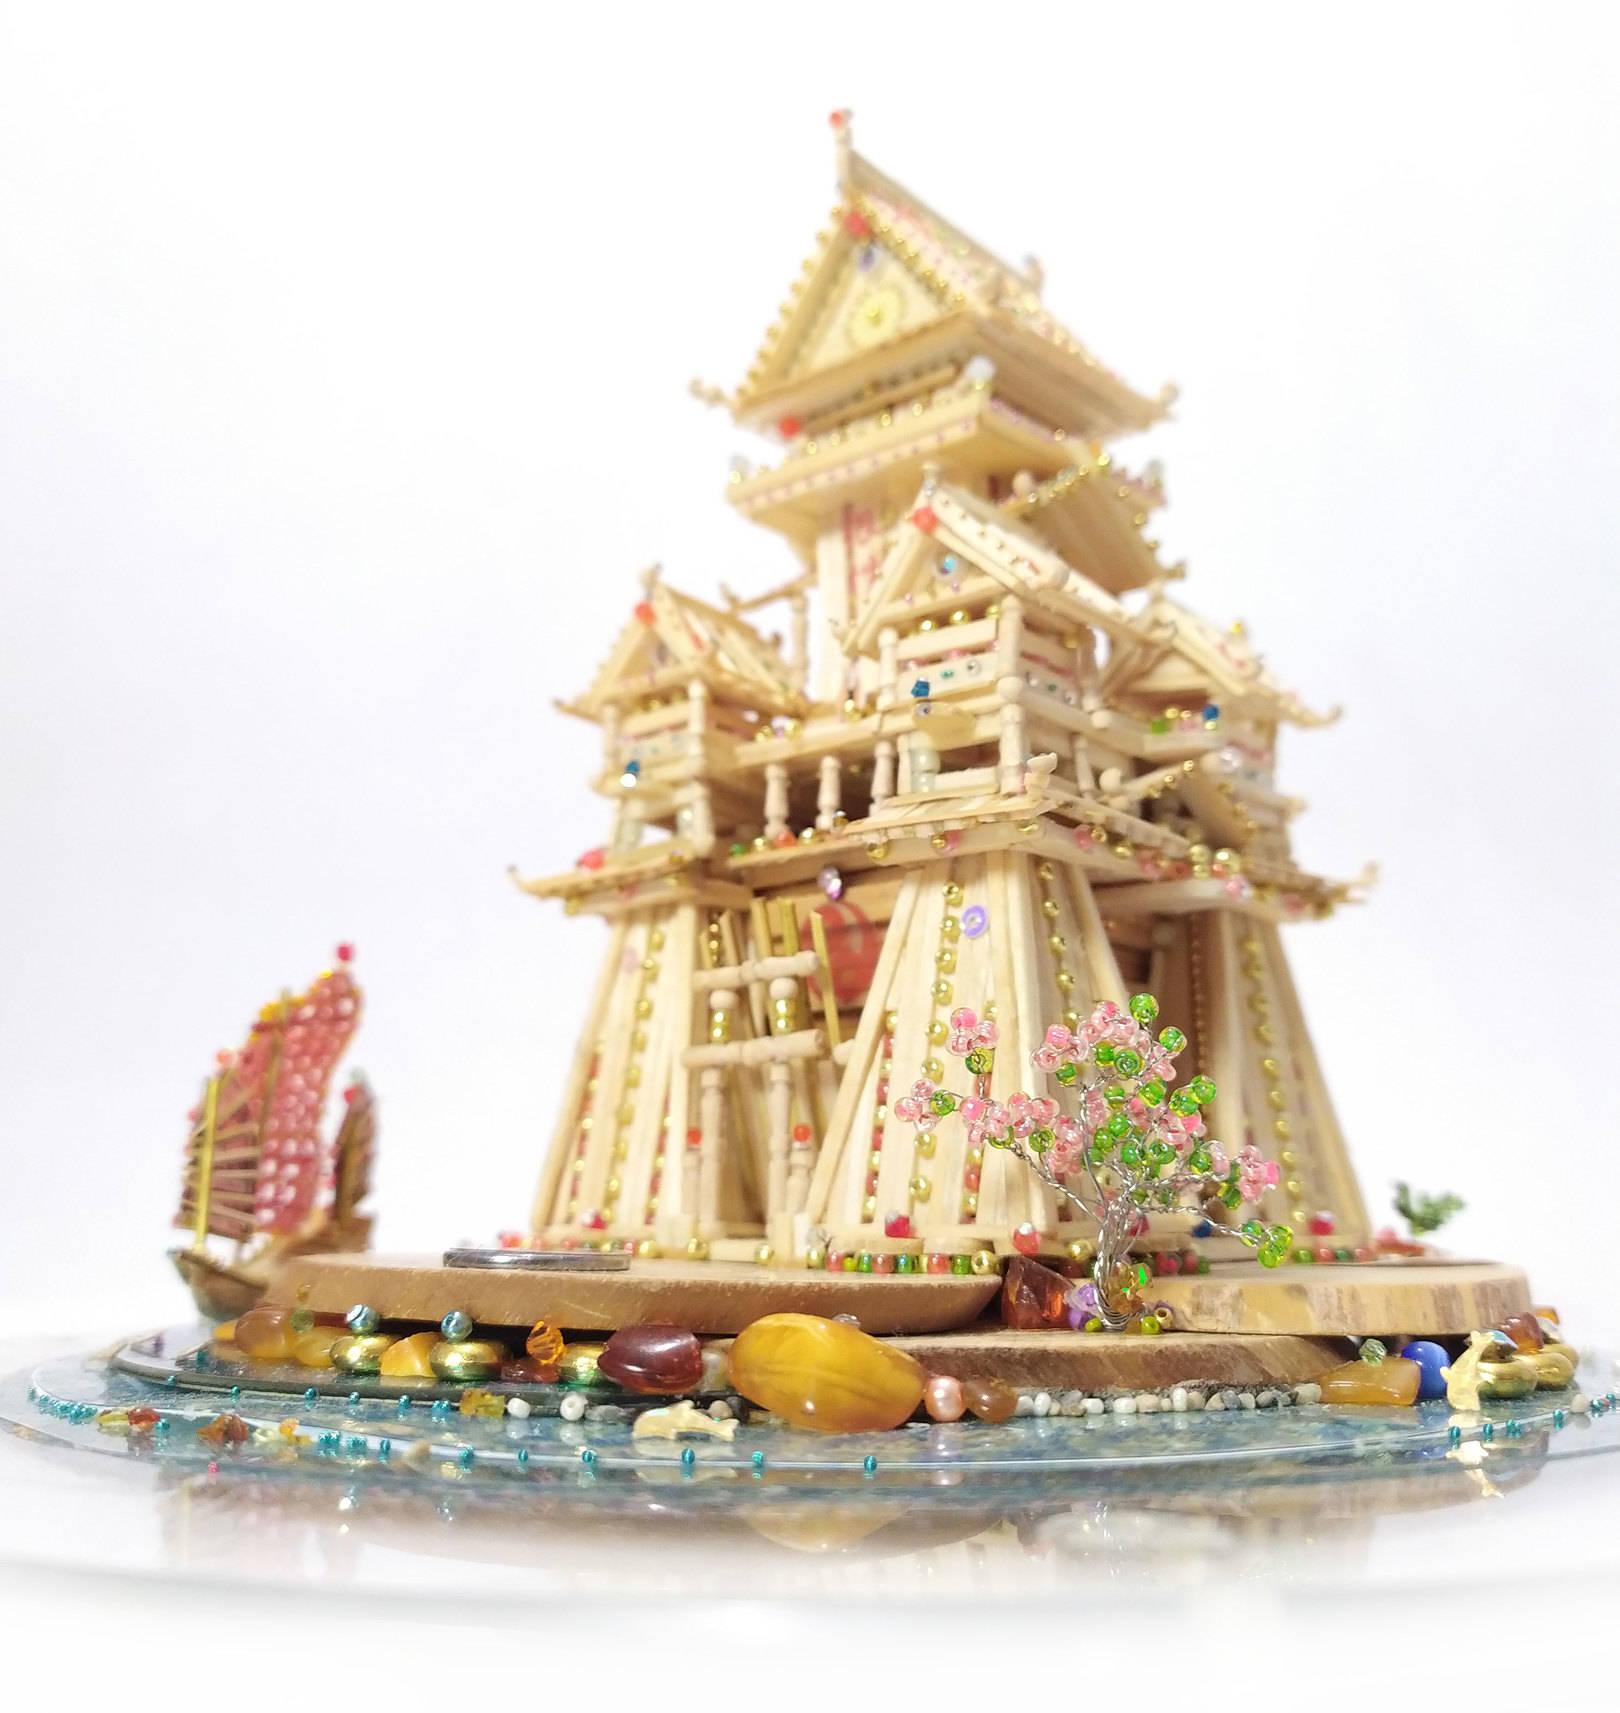 GOLDEN IMPERIAL CASTLE